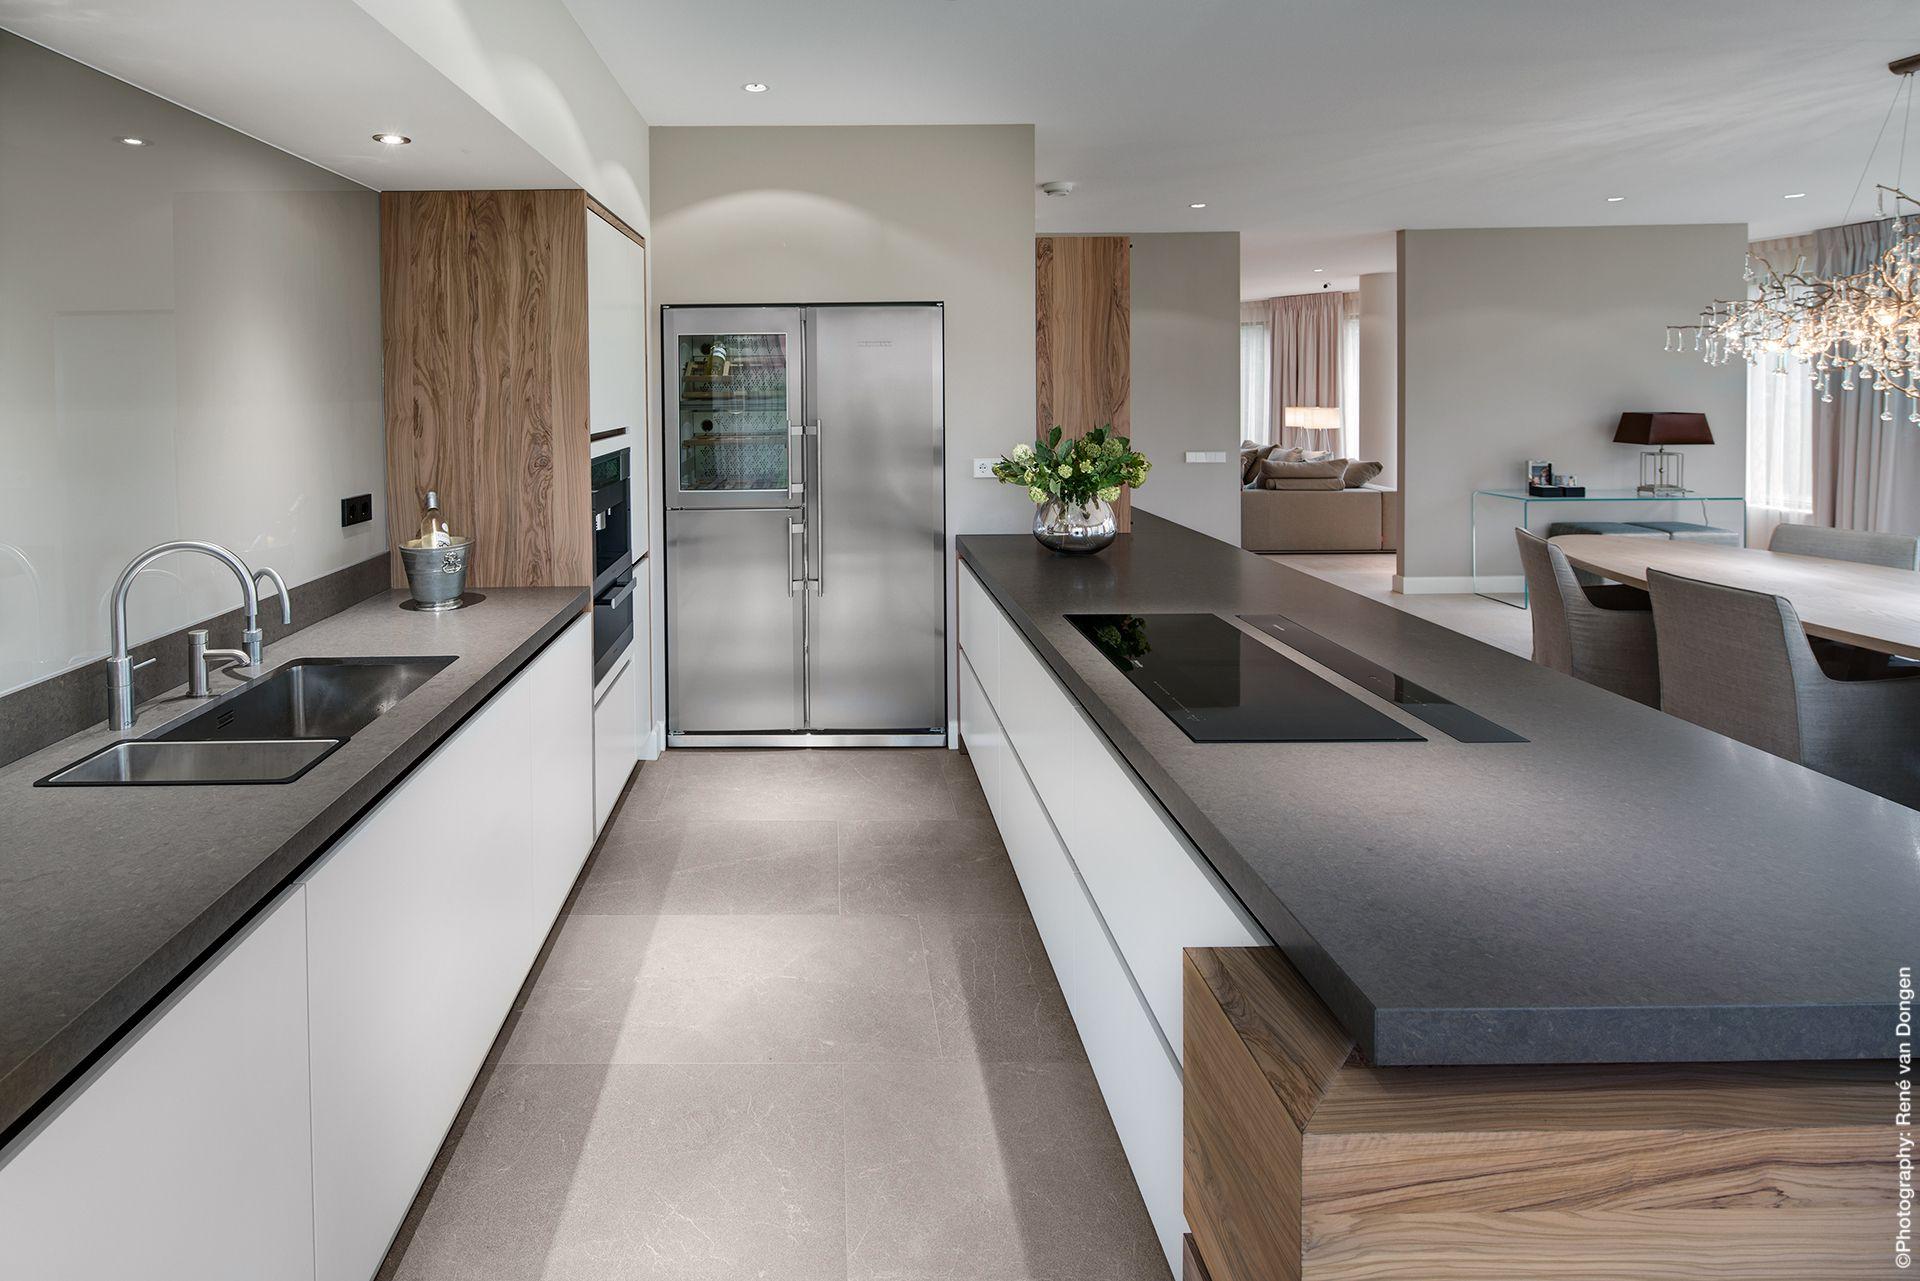 Olijf houten keuken design tinello keuken interieur for Tinello keuken